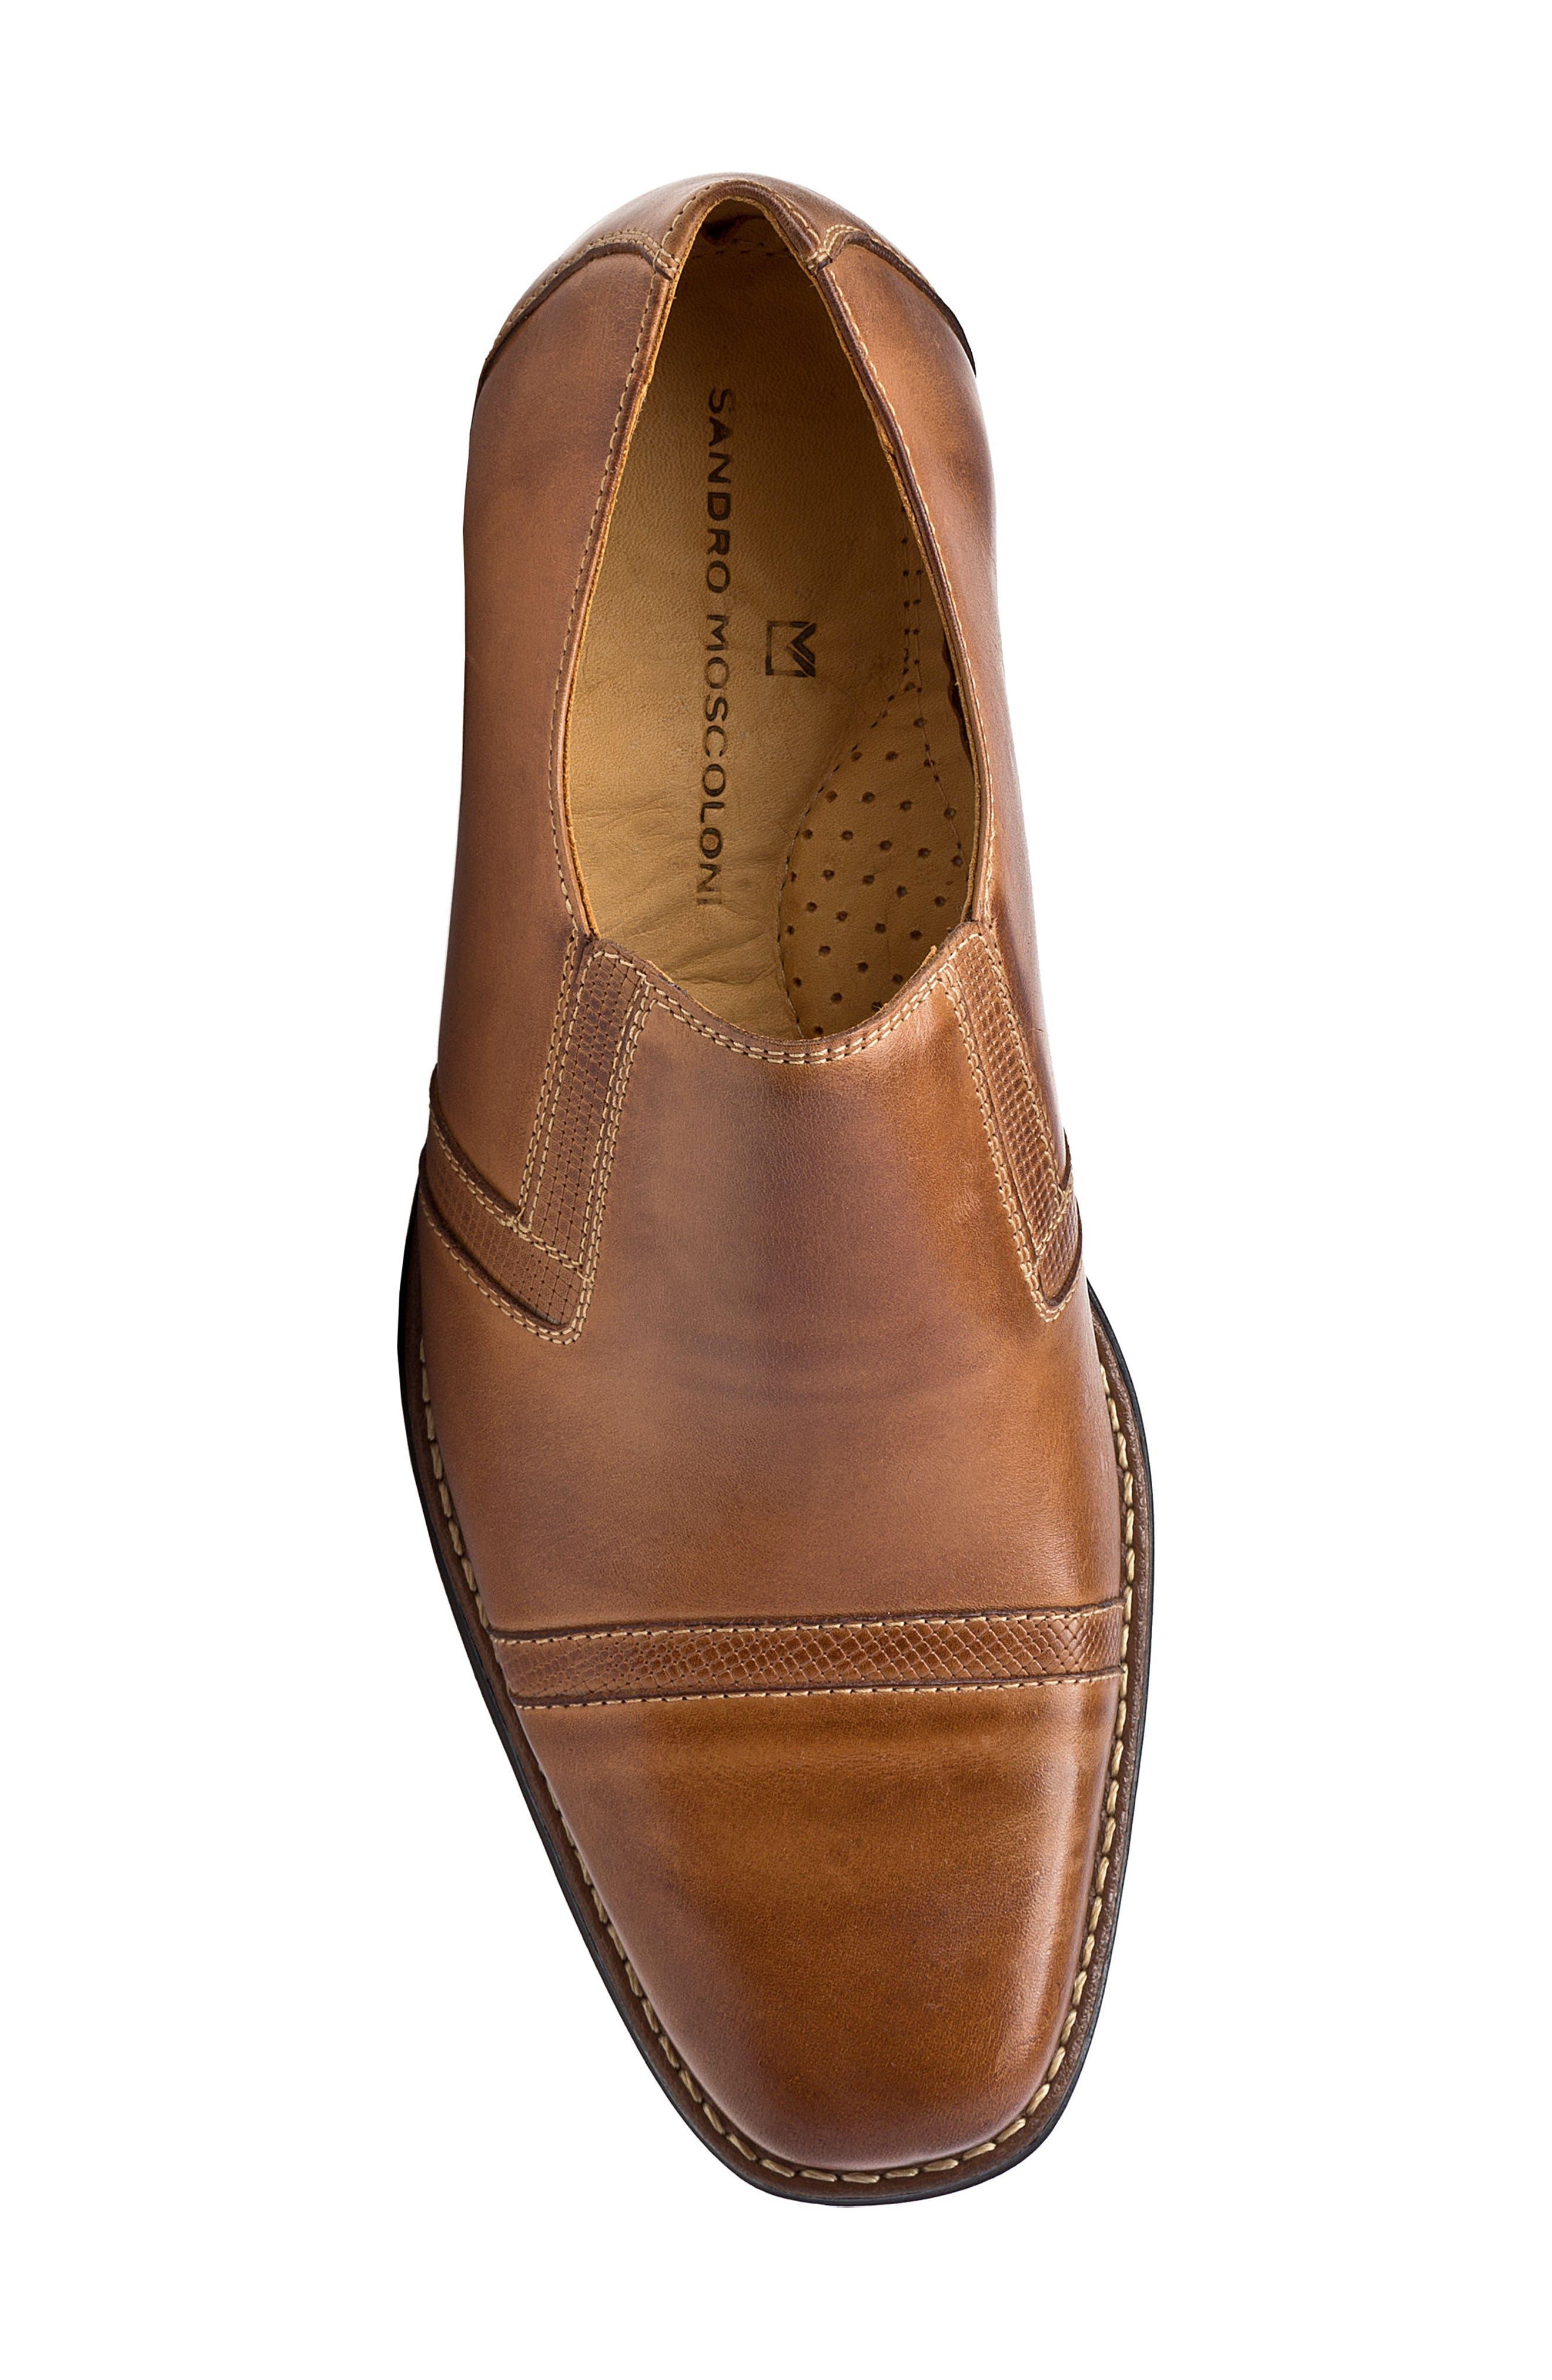 Sebastian Venetian Loafer,                             Alternate thumbnail 5, color,                             Tan Leather